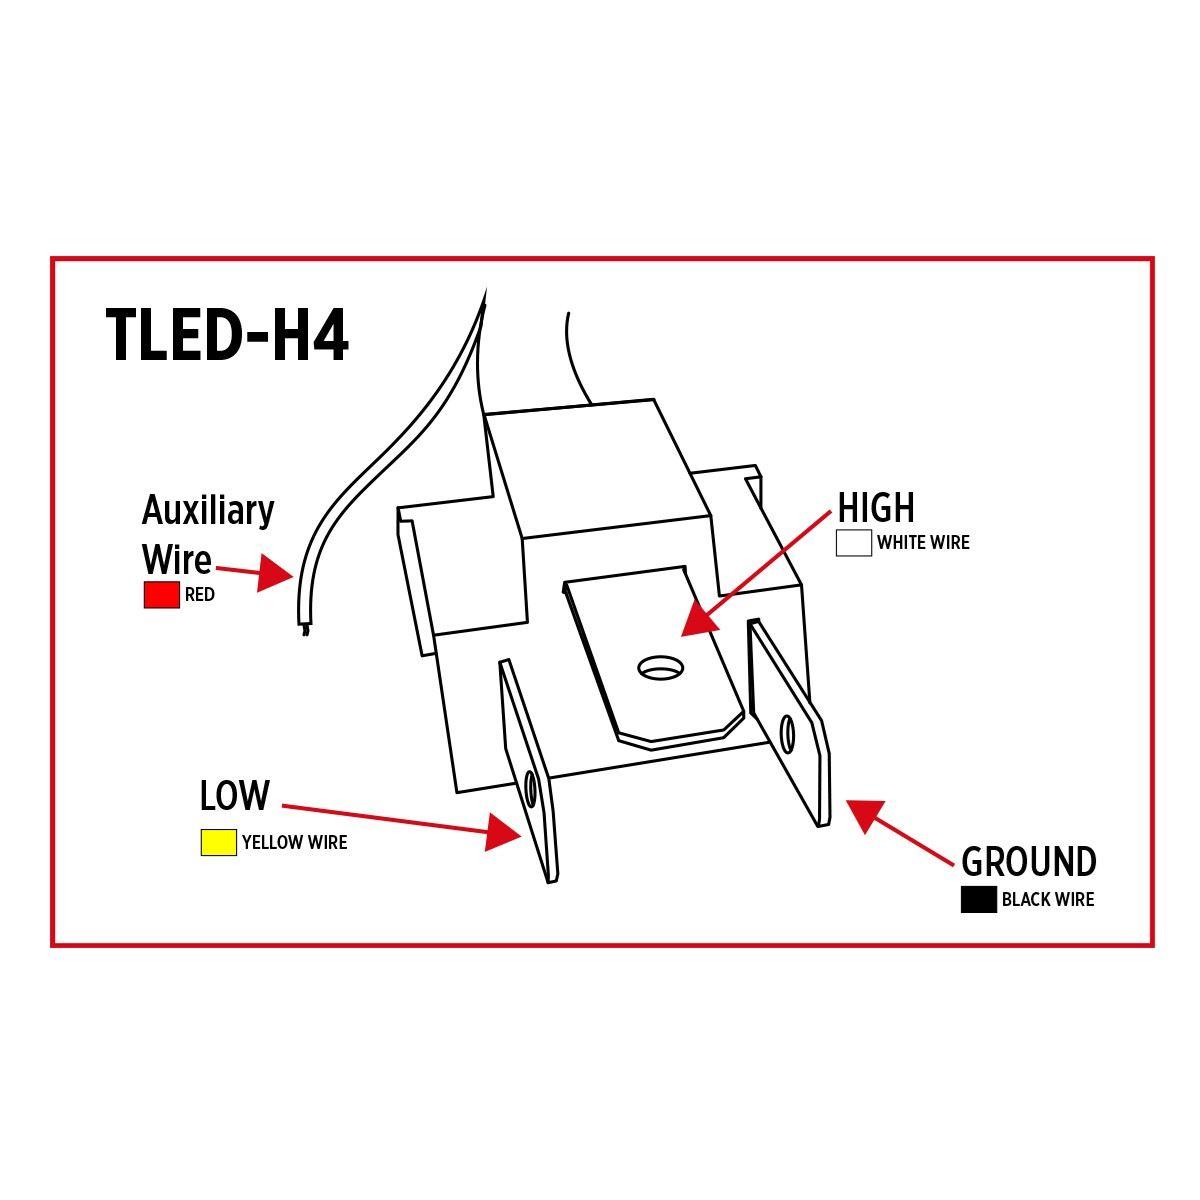 H4651 Headlight Socket Wiring Diagram | Manual E-Books - Headlight Socket Wiring Diagram